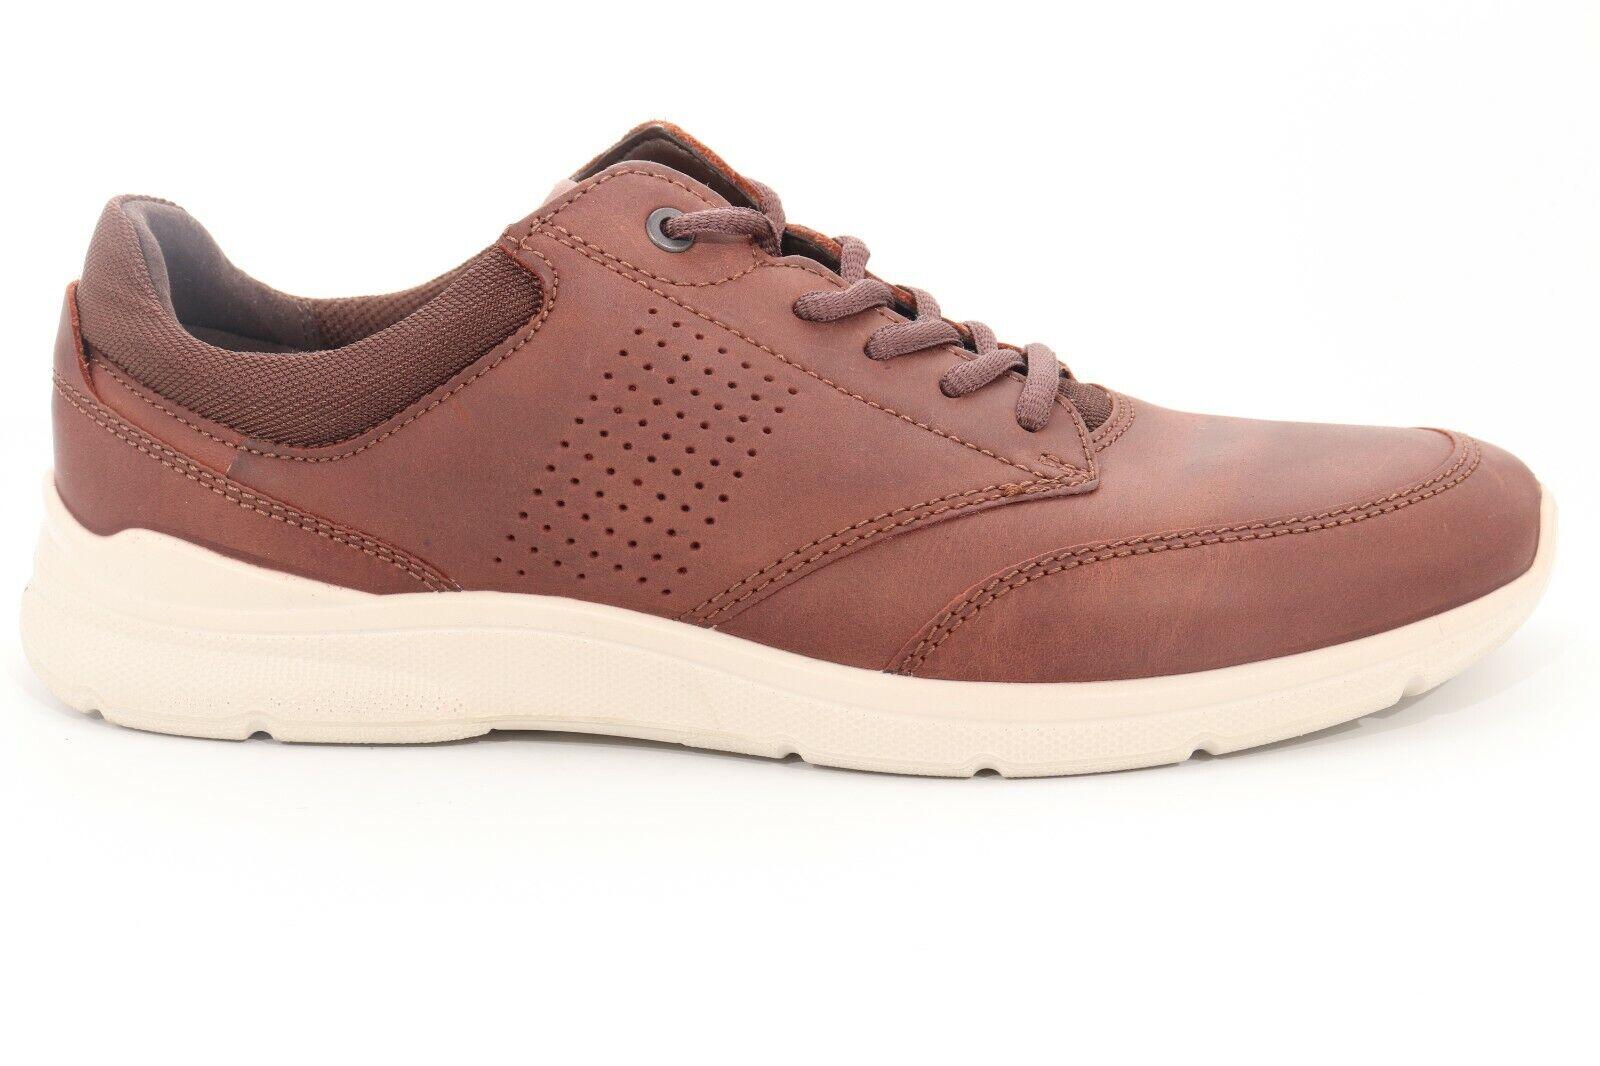 Ecco Irving Fashion Sneaker Casual Mink Men's Size 44